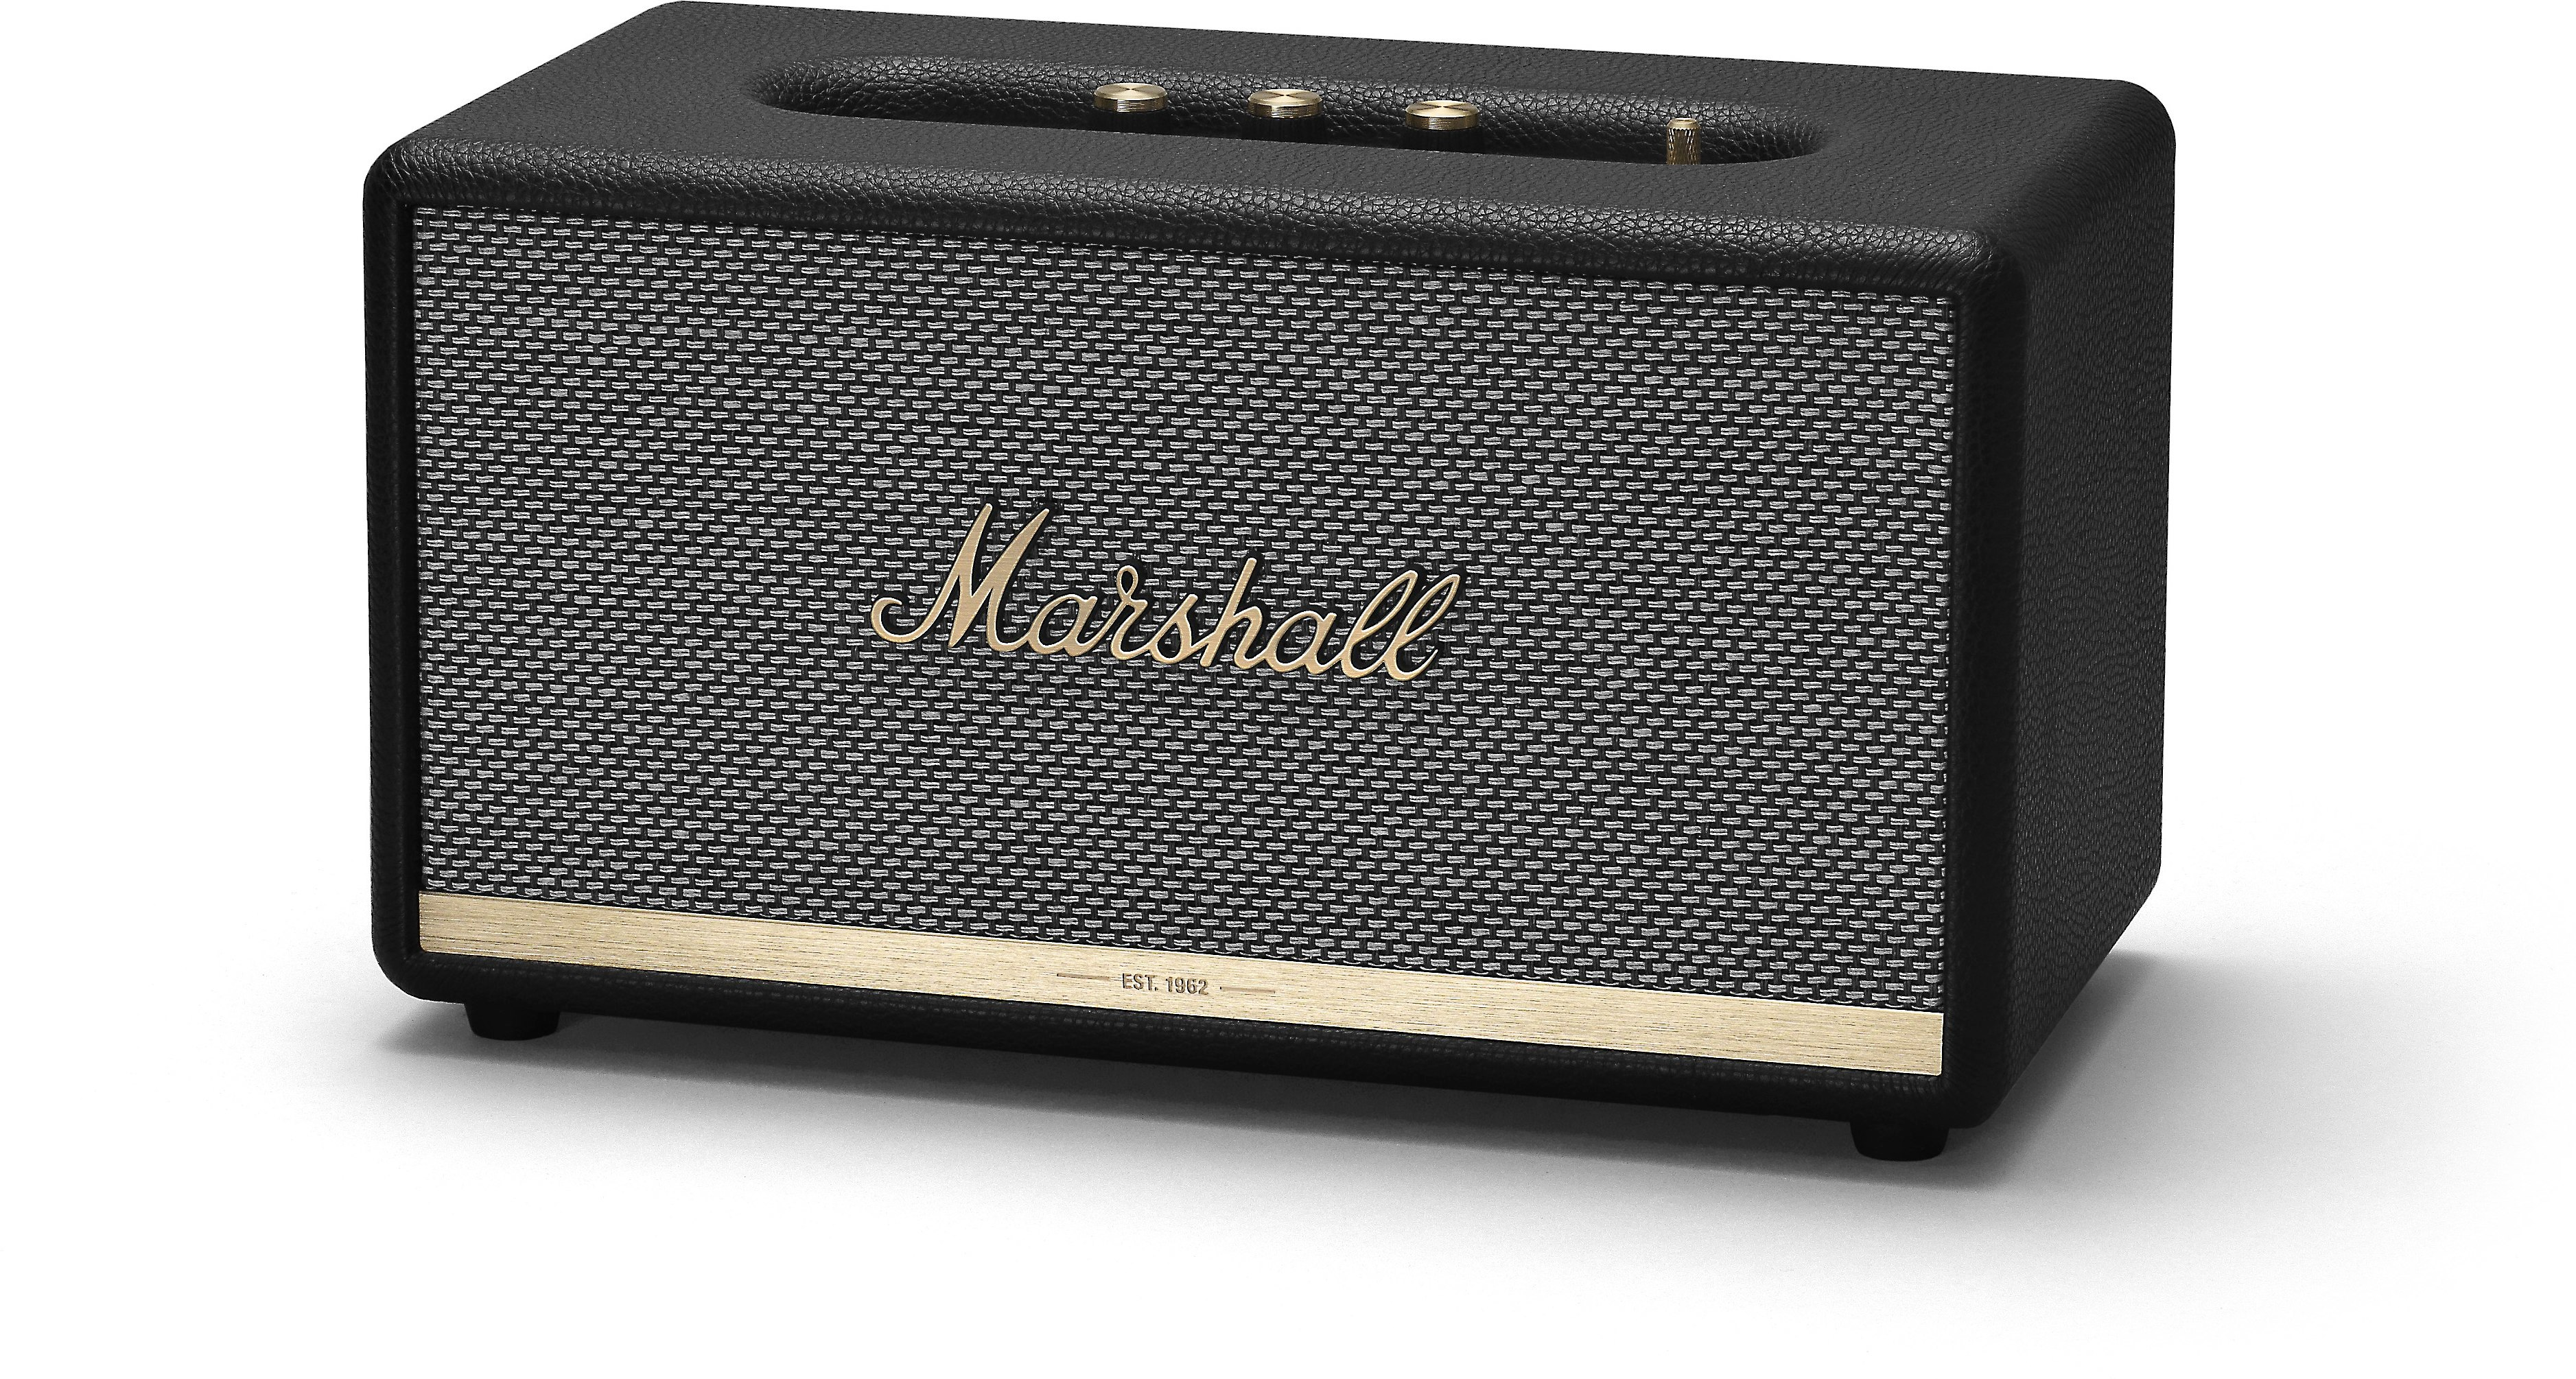 Marshall Stanmore Ii Bluetooth Black Powered Bluetooth Speaker At Crutchfield